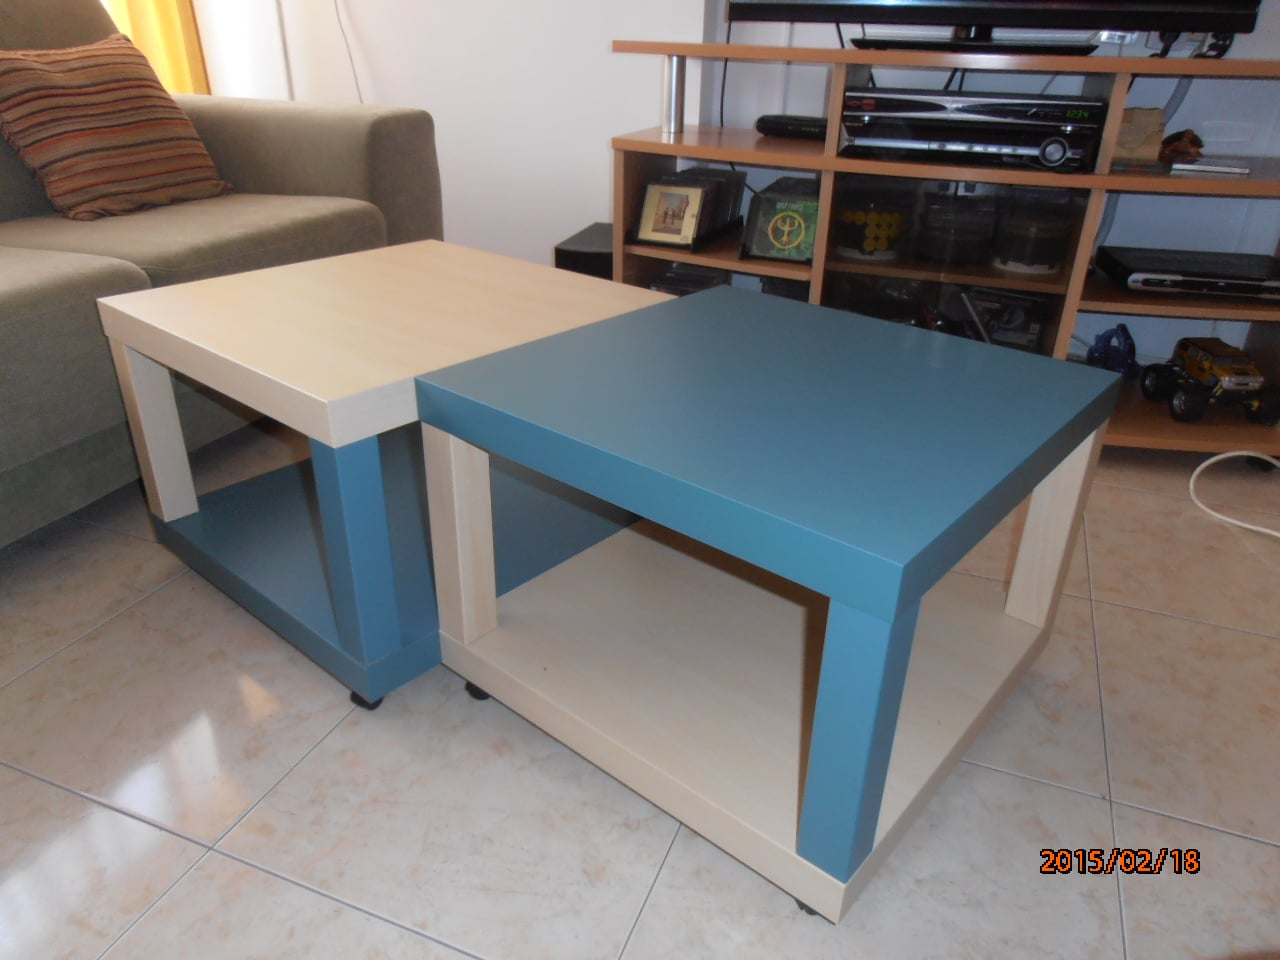 quad lack coffee table ikea hackers. Black Bedroom Furniture Sets. Home Design Ideas